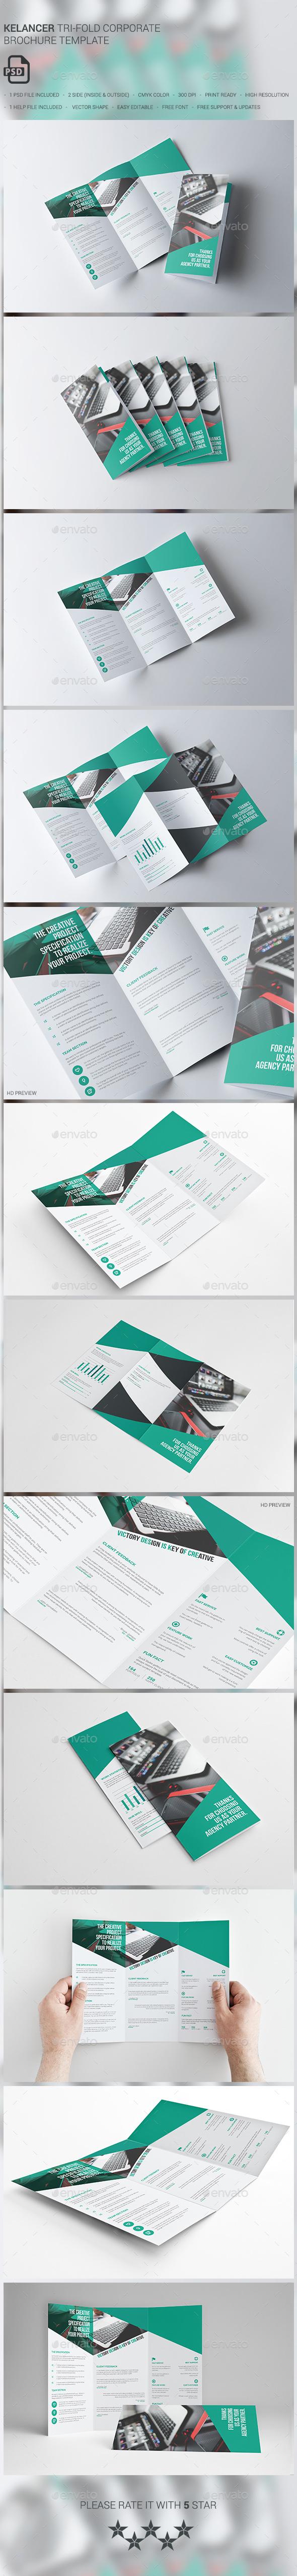 Kelancer Corporate Trifold Brochure - Brochures Print Templates